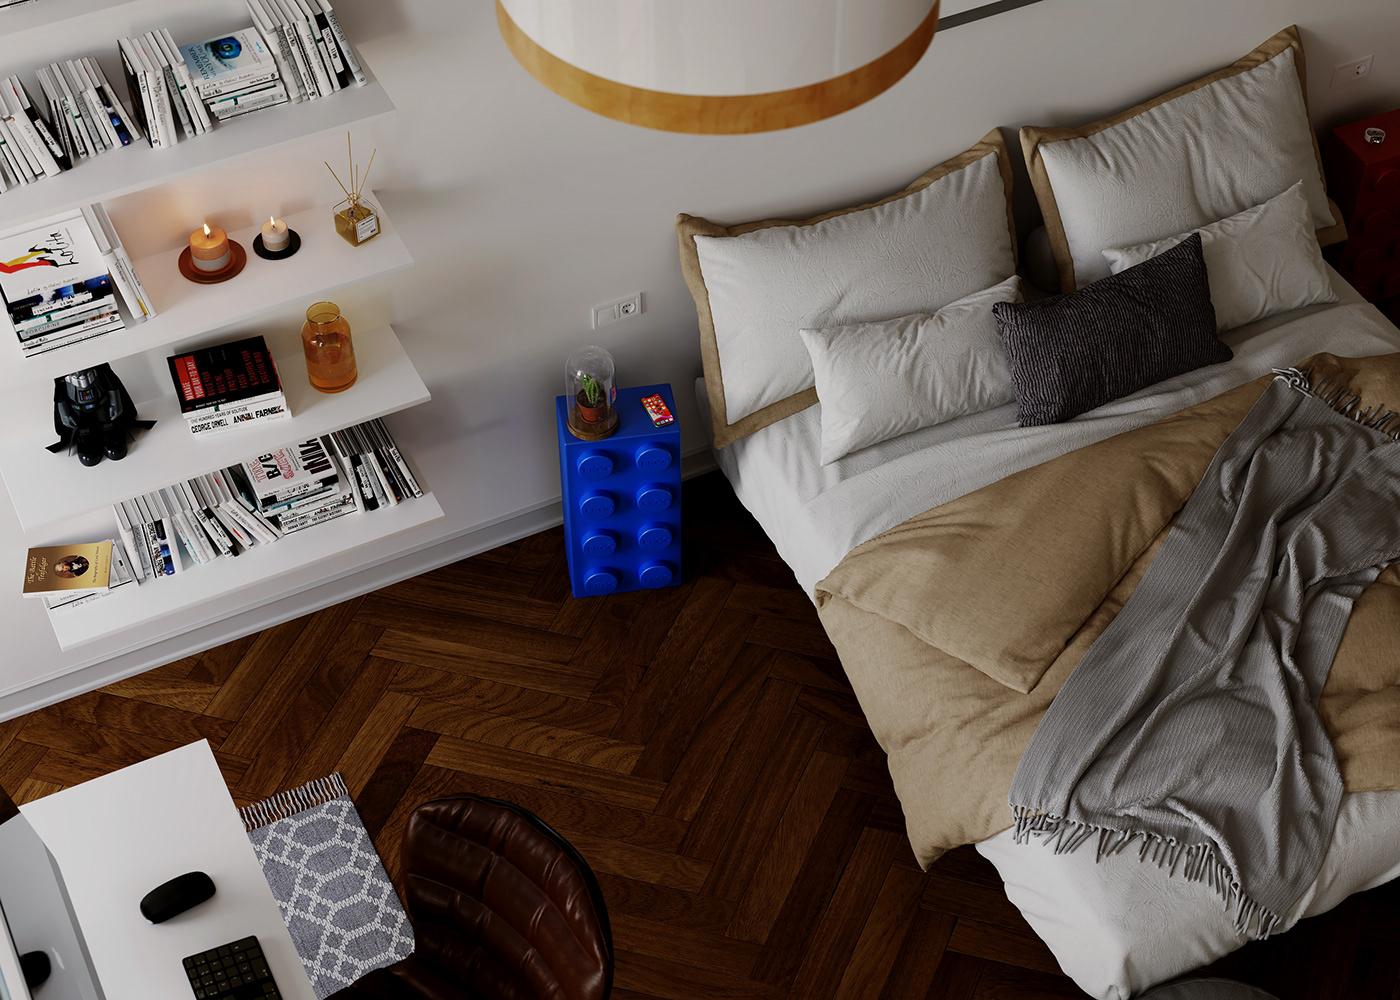 adobephotoshop Archivz cinema4d CoronaRender  Fotorrealismo Interiorismo MarvelousDesigner Render room